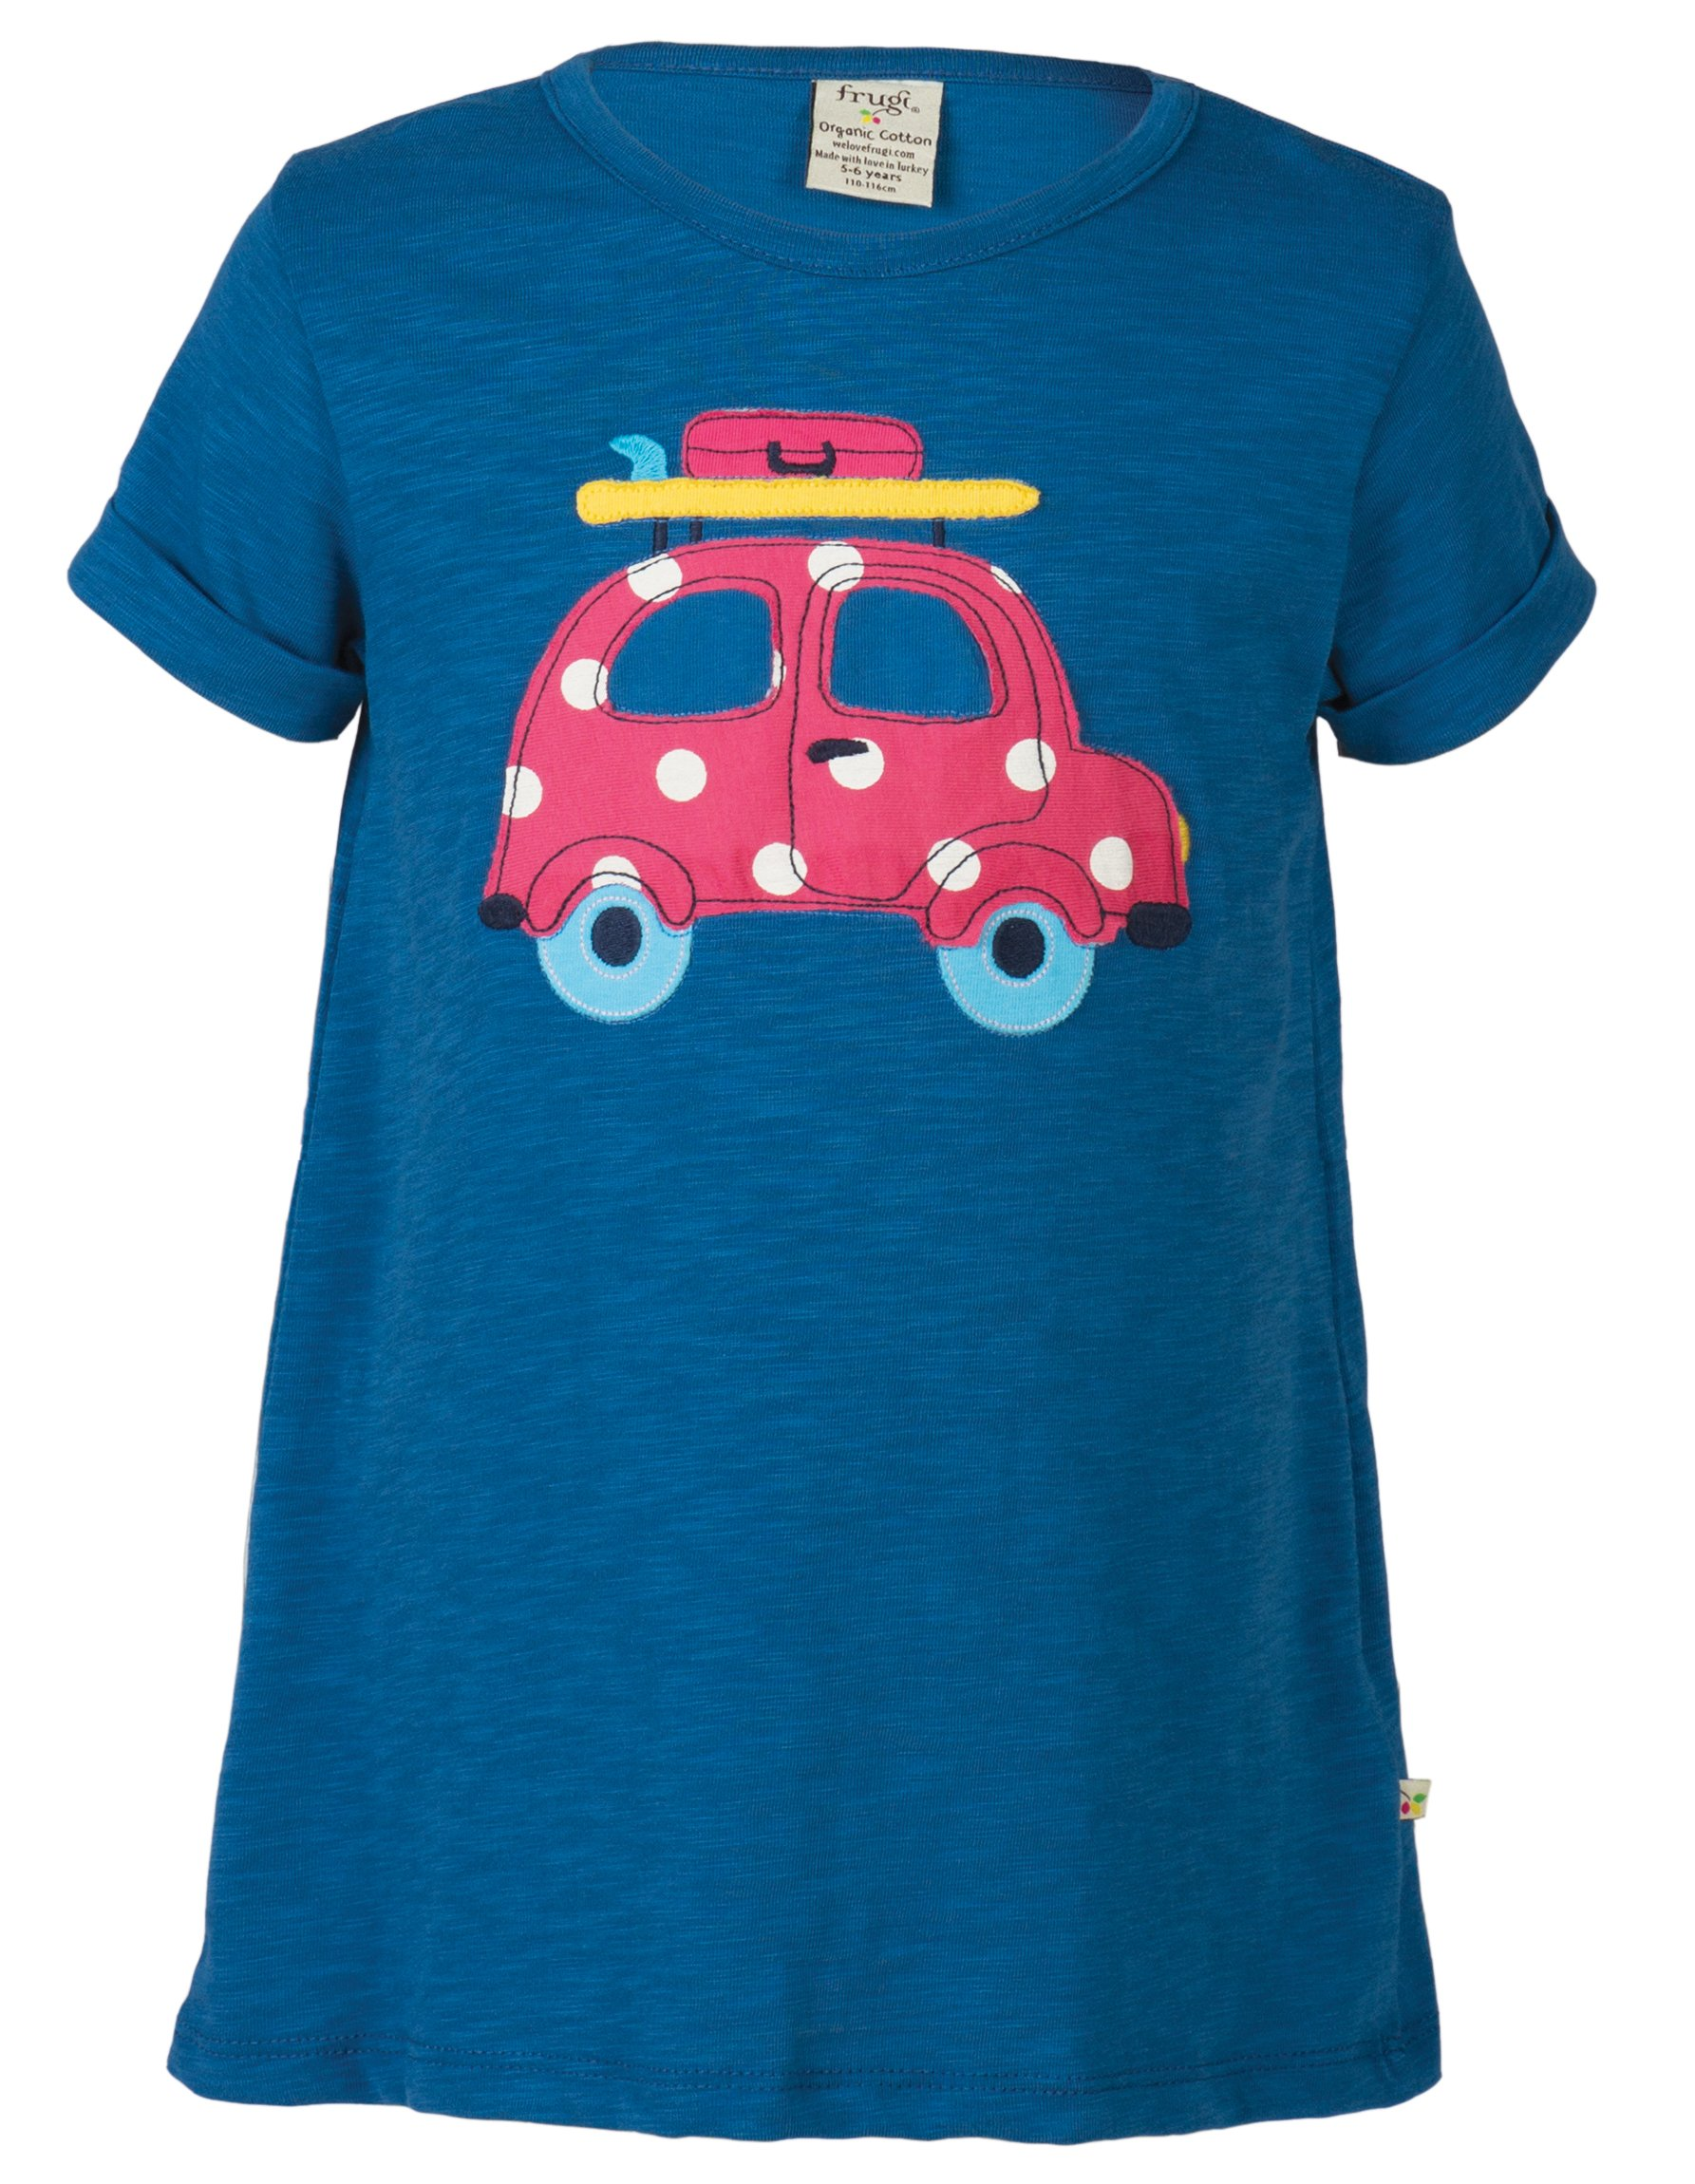 T-shirt con macchina